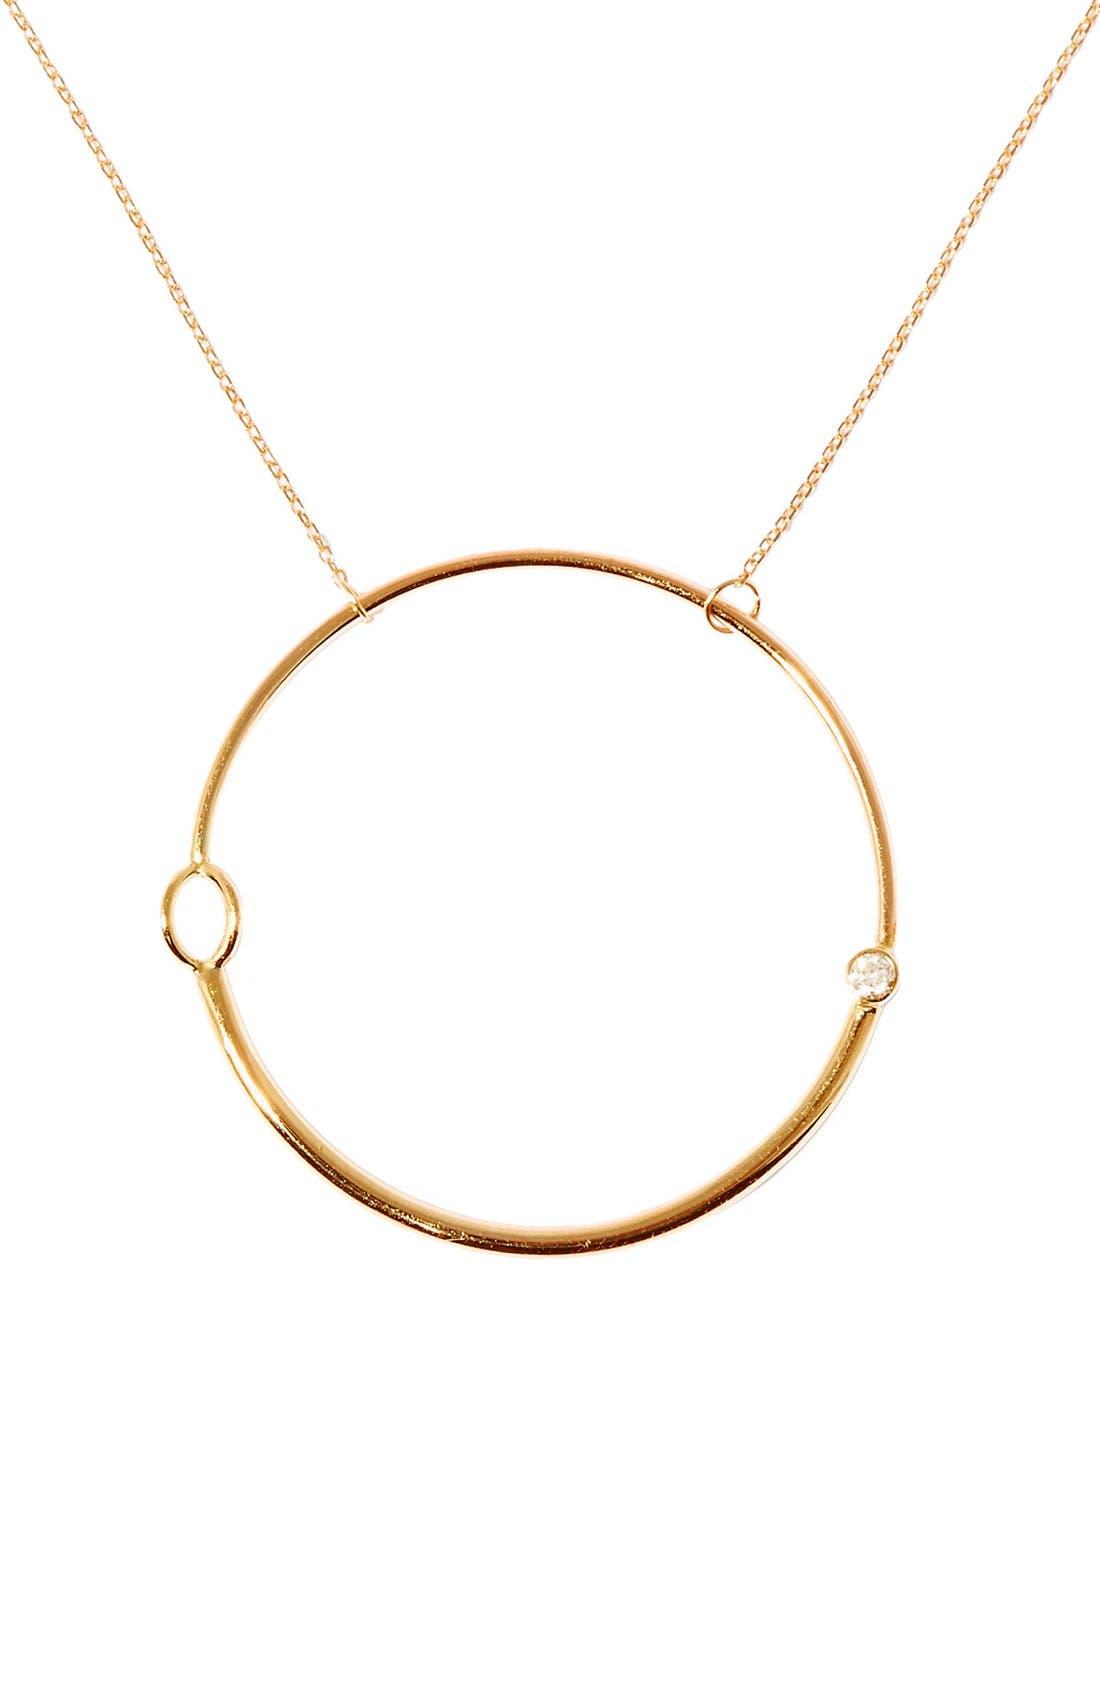 SARAH & SEBASTIAN 'Large Foam' Gold & Diamond Pendant Necklace